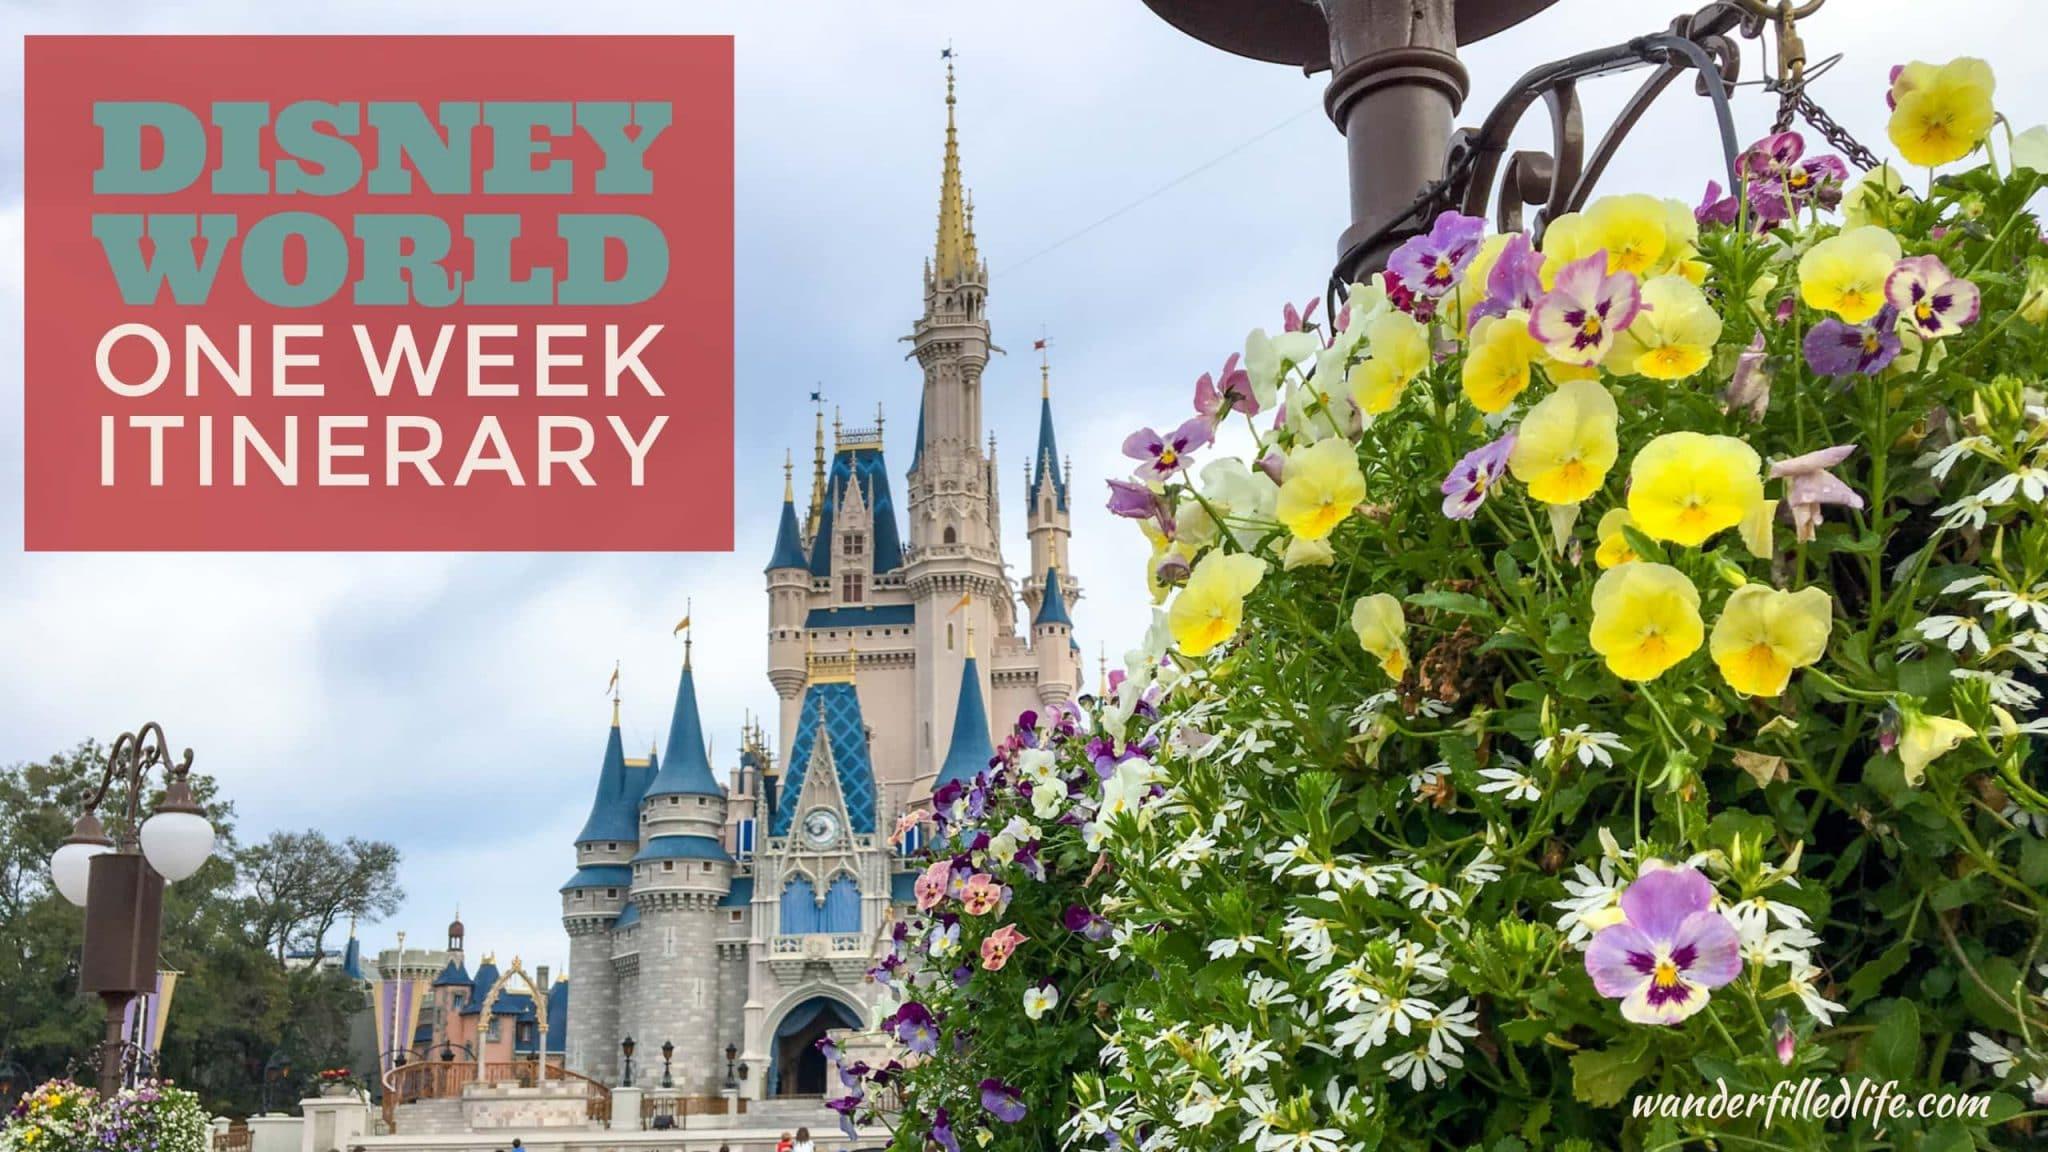 Disney World One Week Itinerary